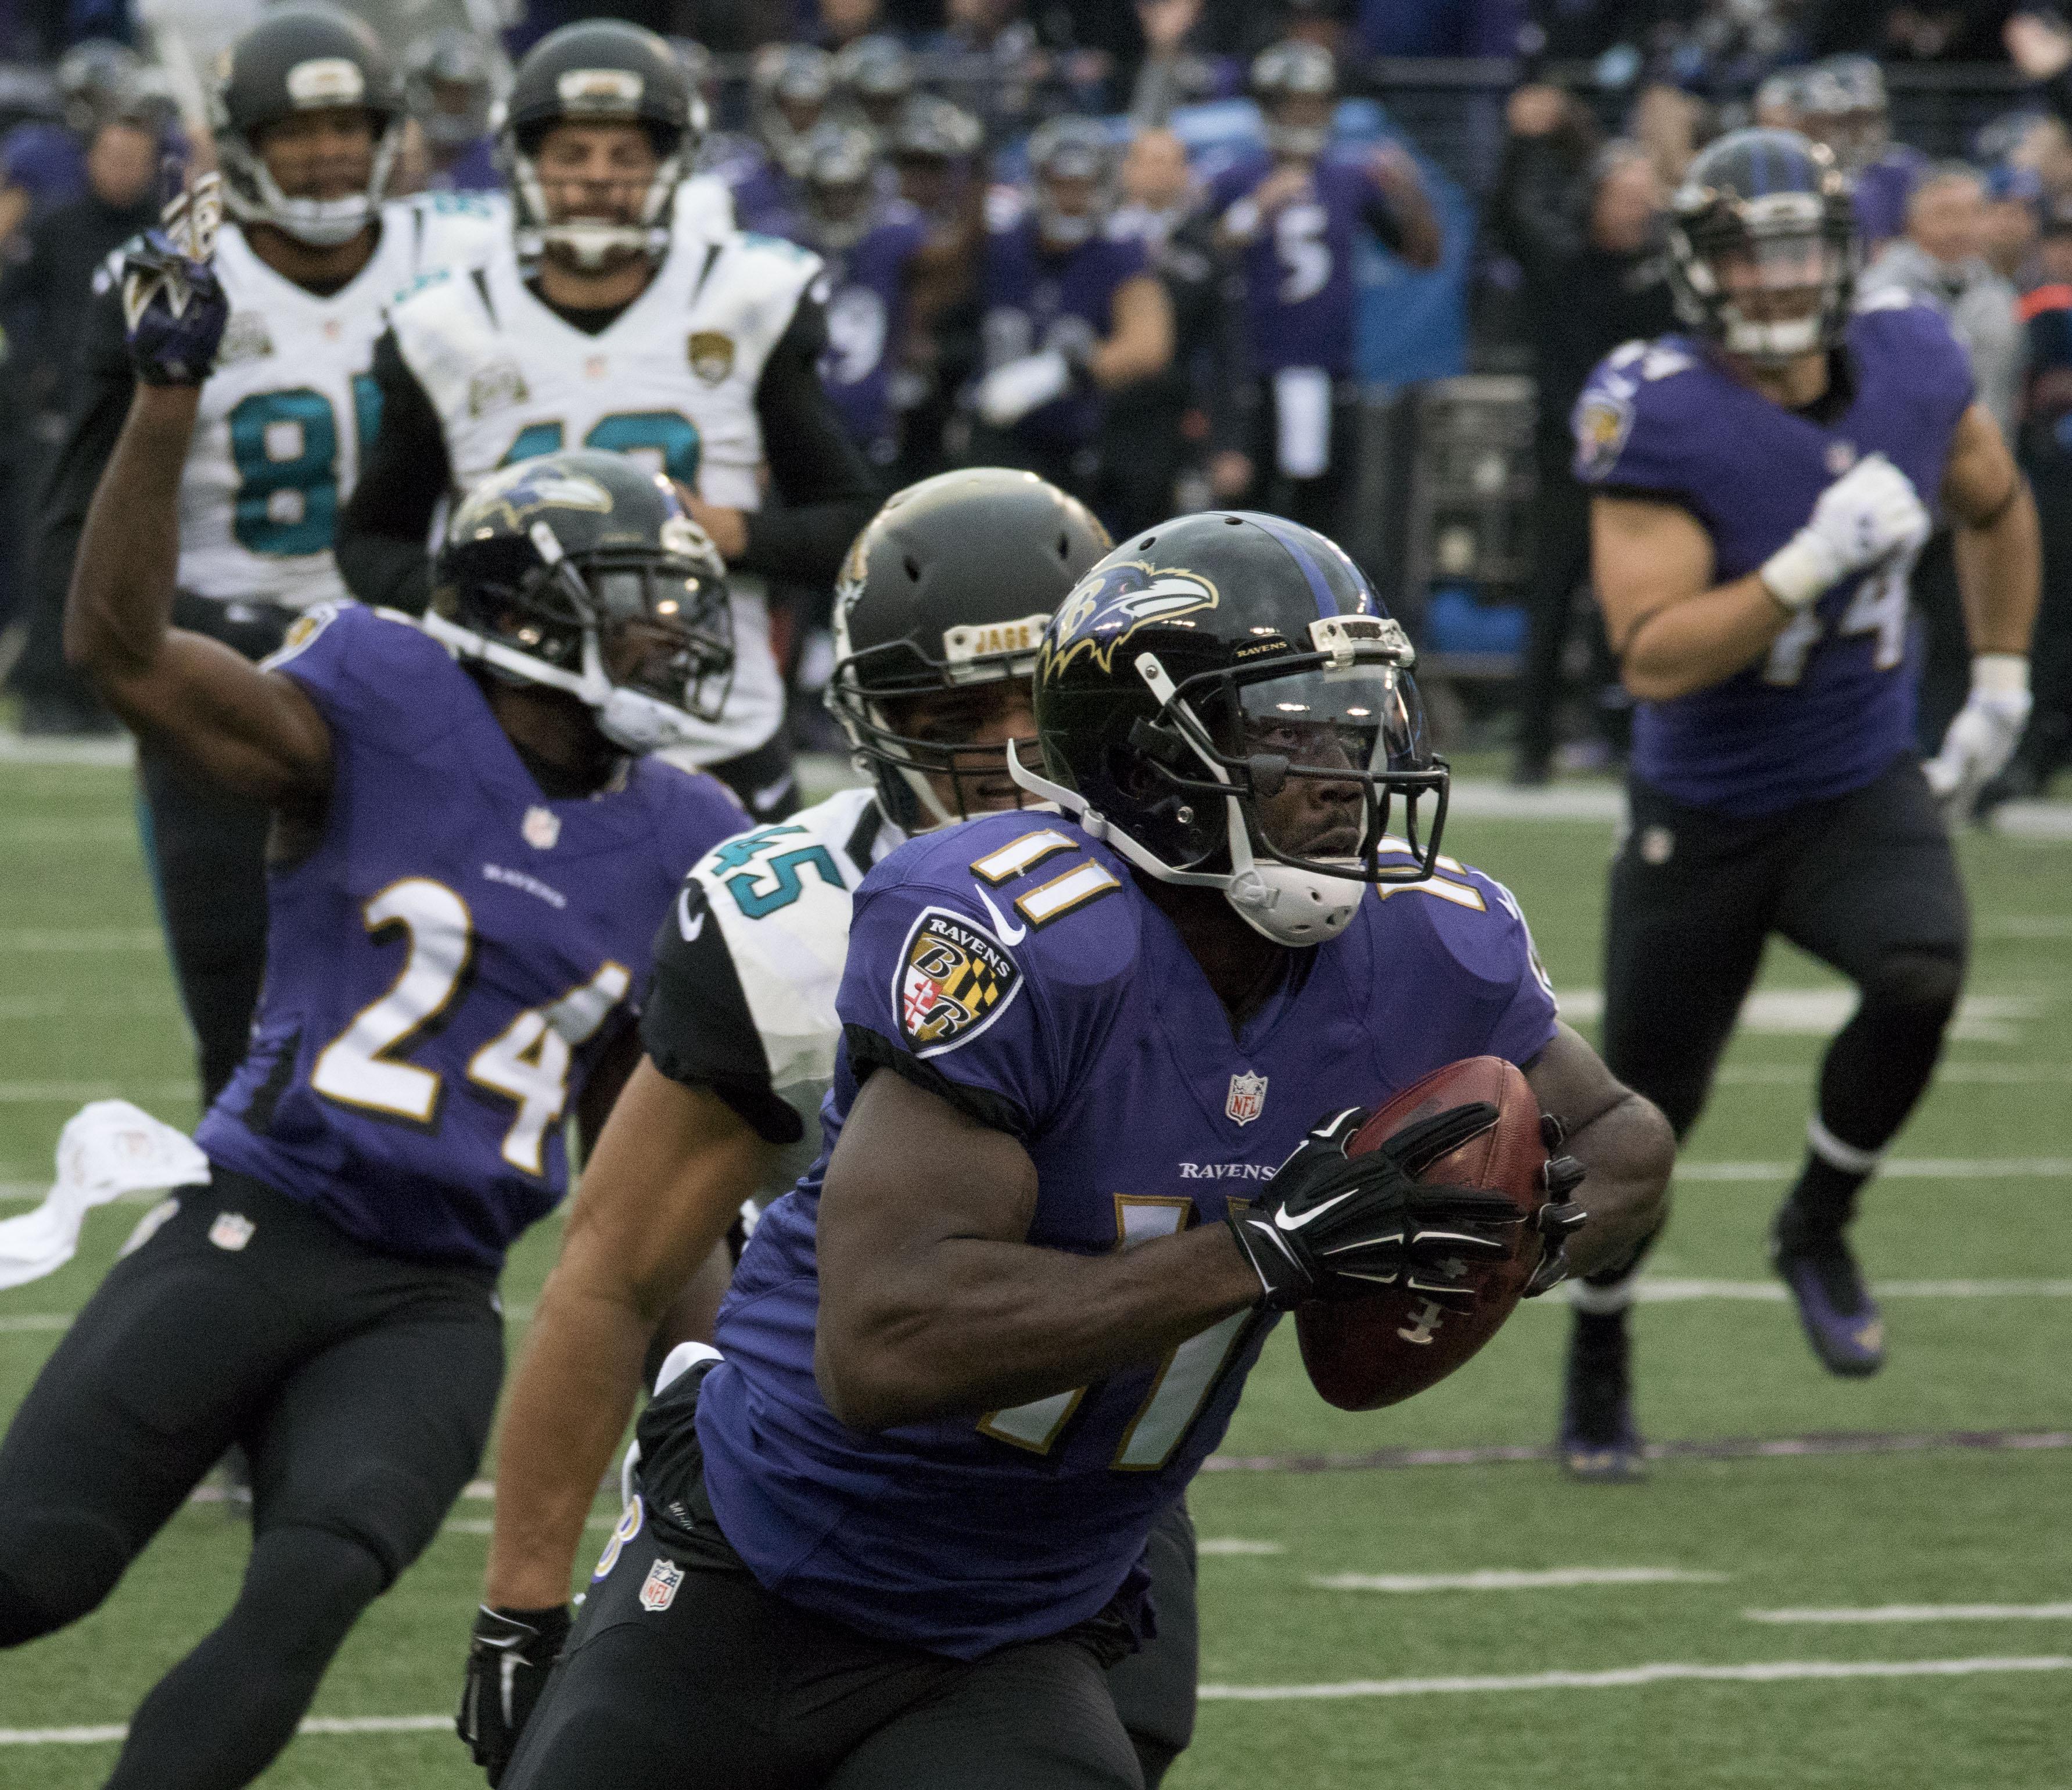 Baltimore Wallpaper: Baltimore Ravens Full HD Wallpaper And Background Image